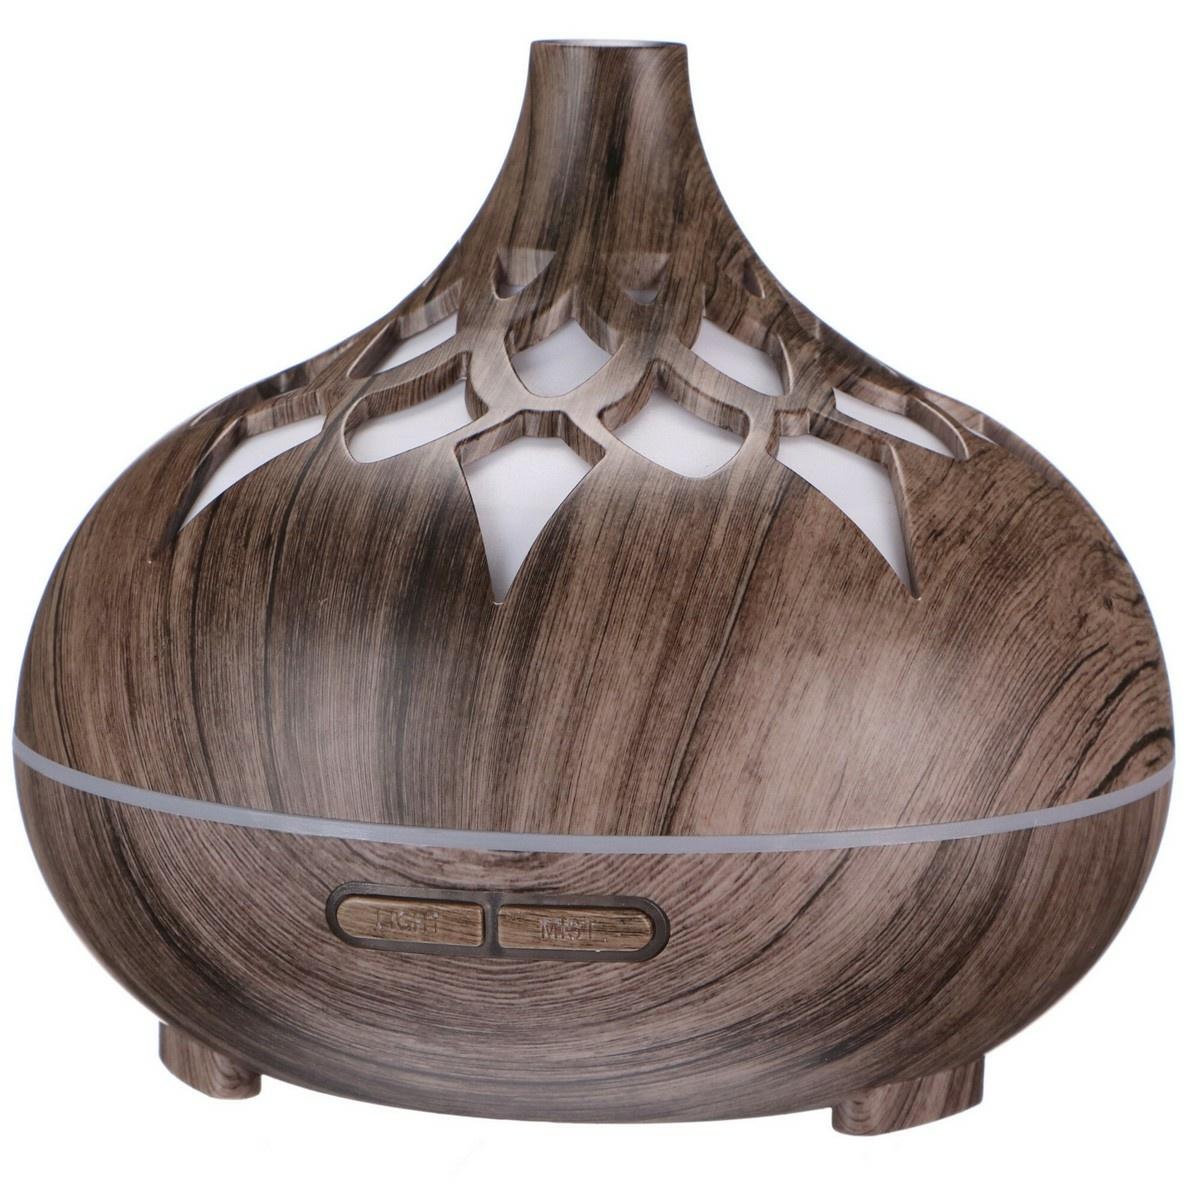 Sixtol Aróma difuzér Palm sivé drevo, 500 ml